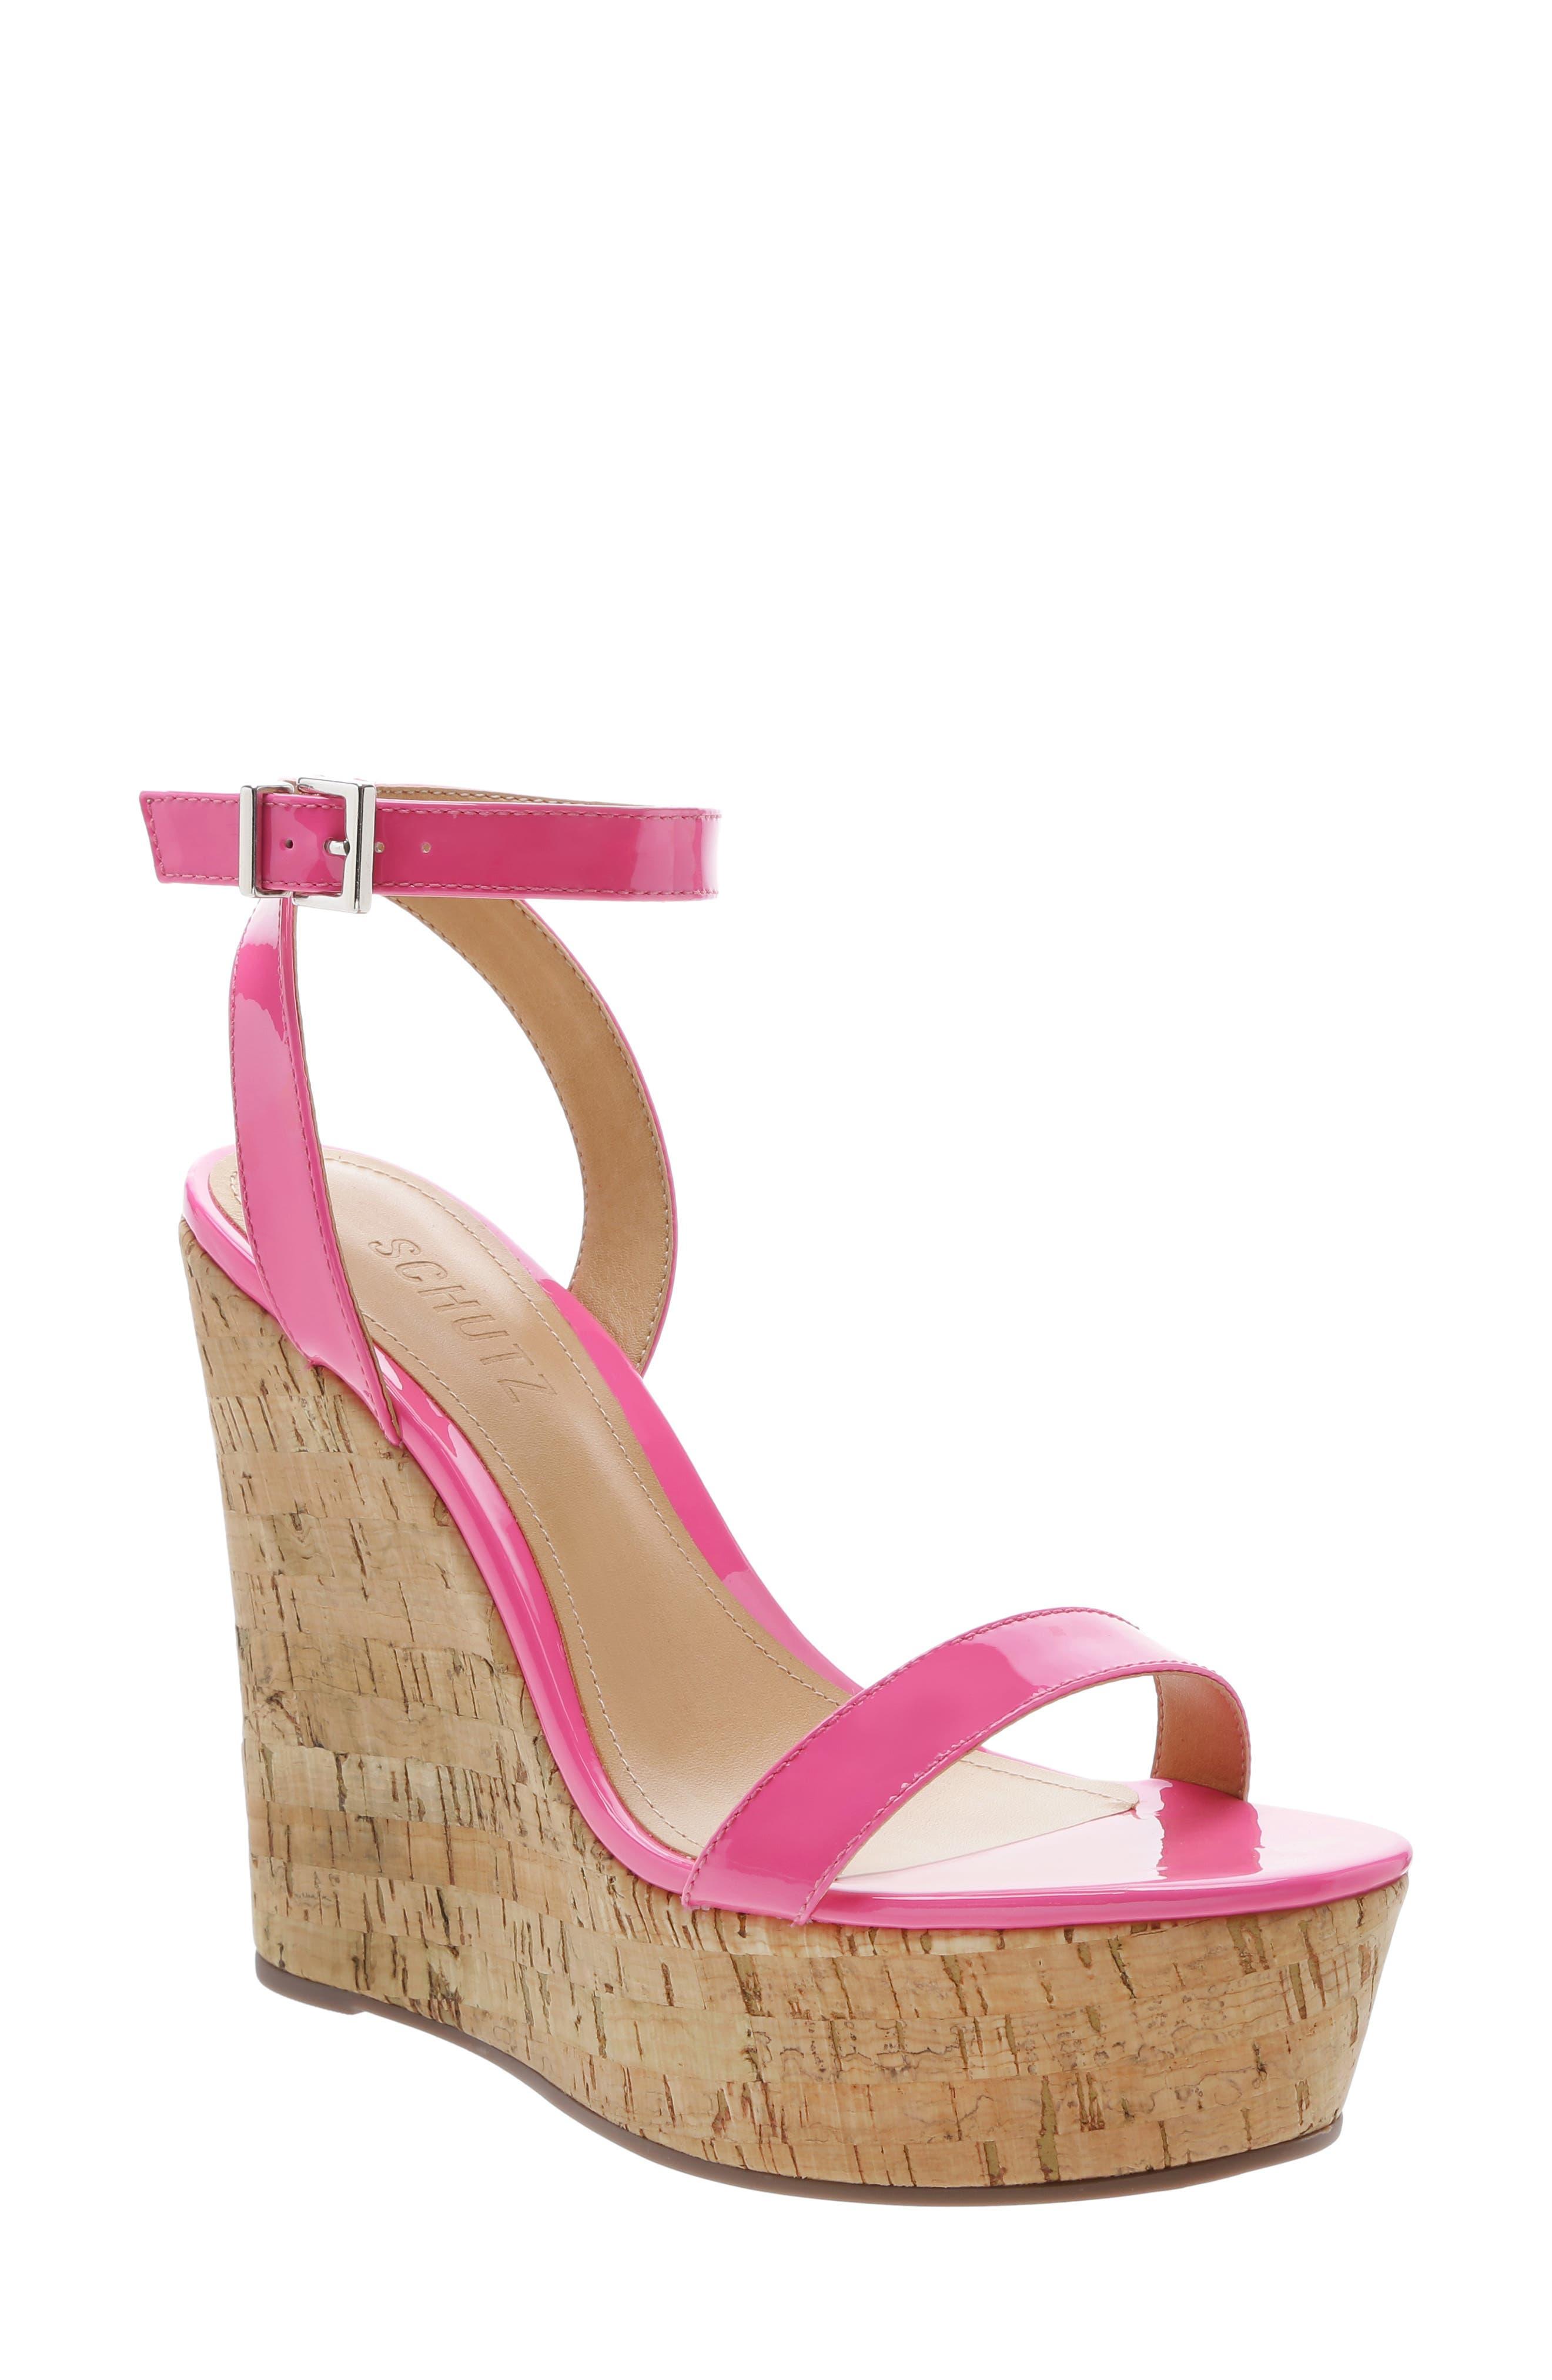 Schutz Eduarda Platform Wedge Sandal- Pink